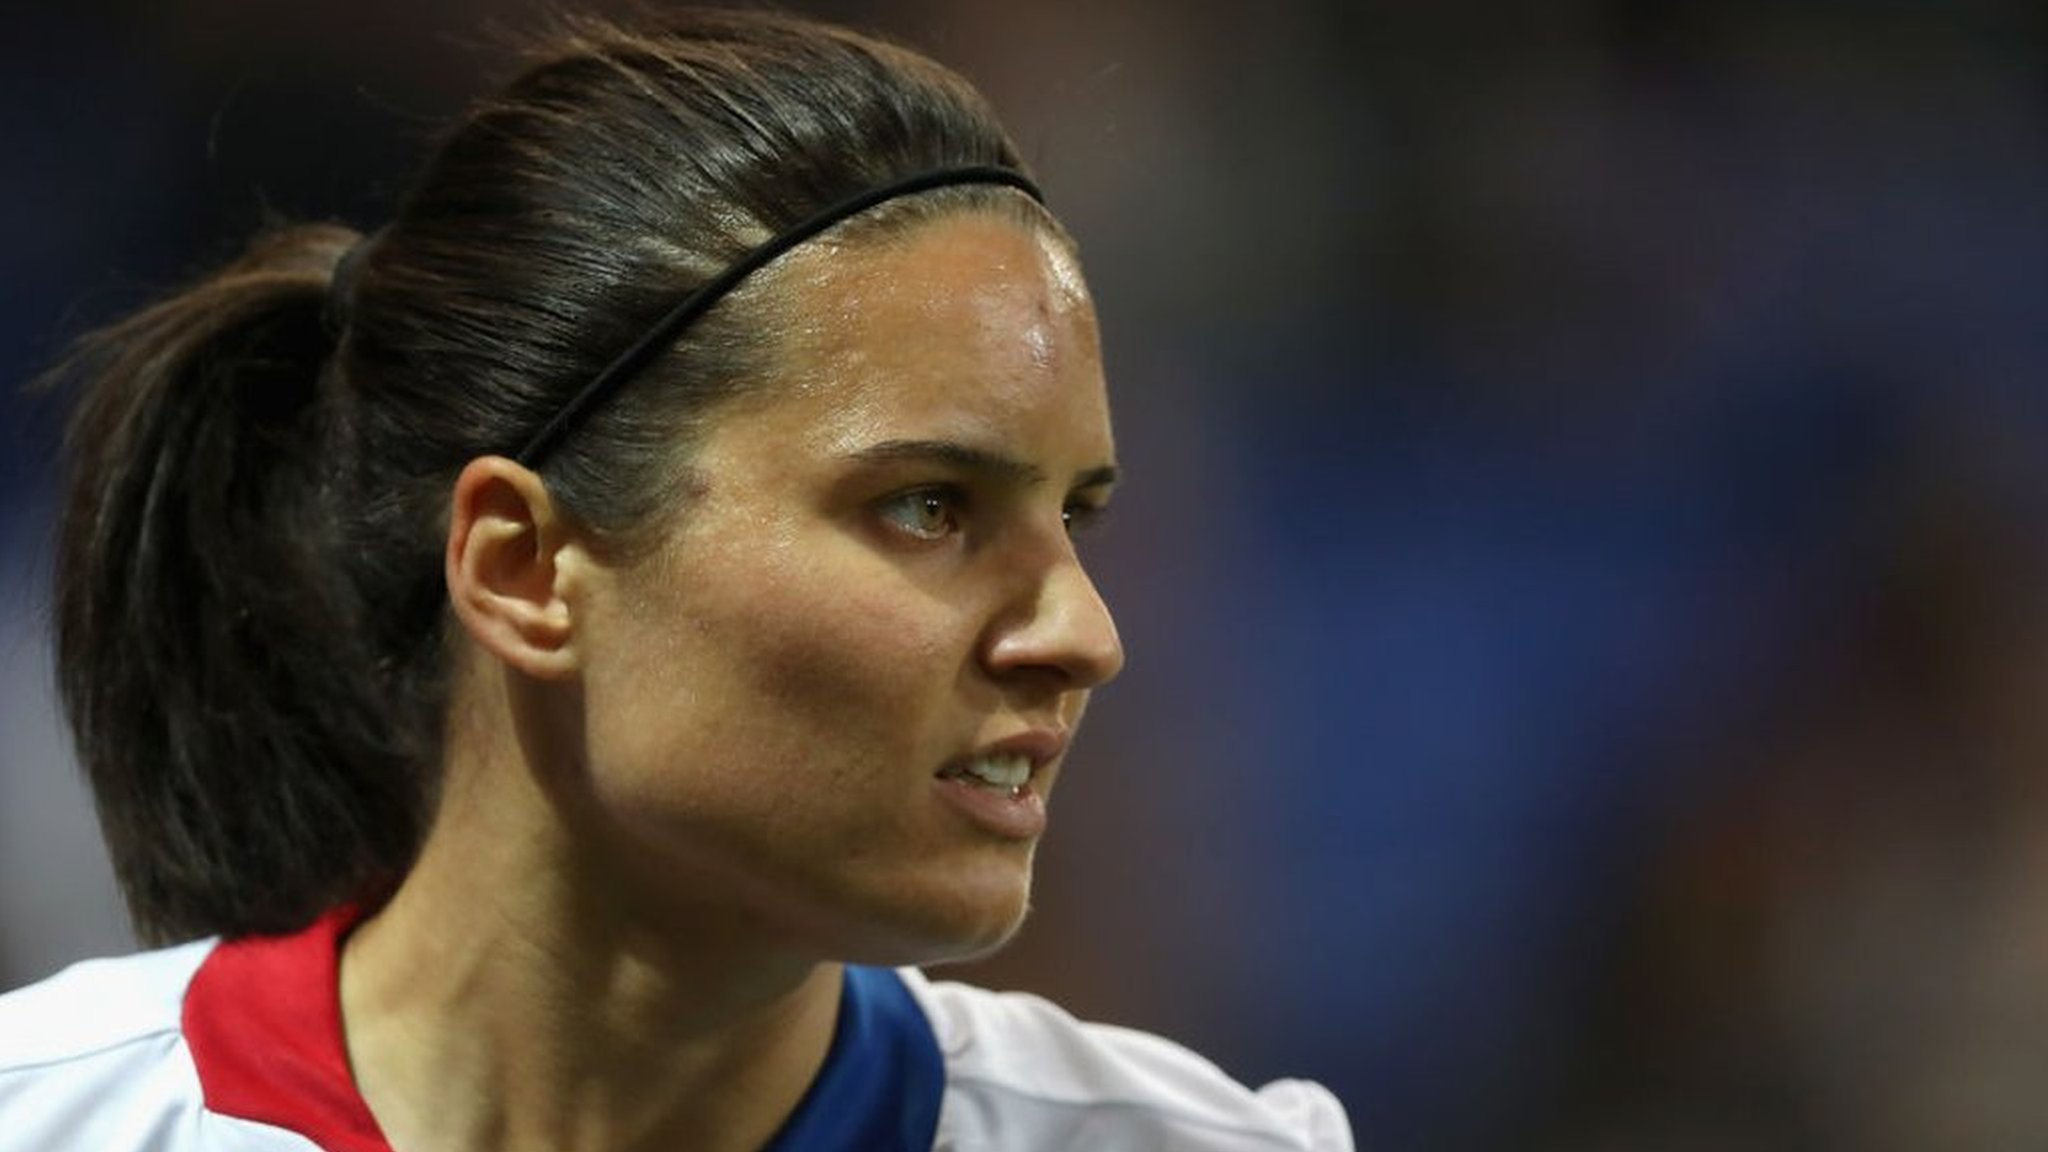 Women's Footballer of the Year contender Dzsenifer Marozsan